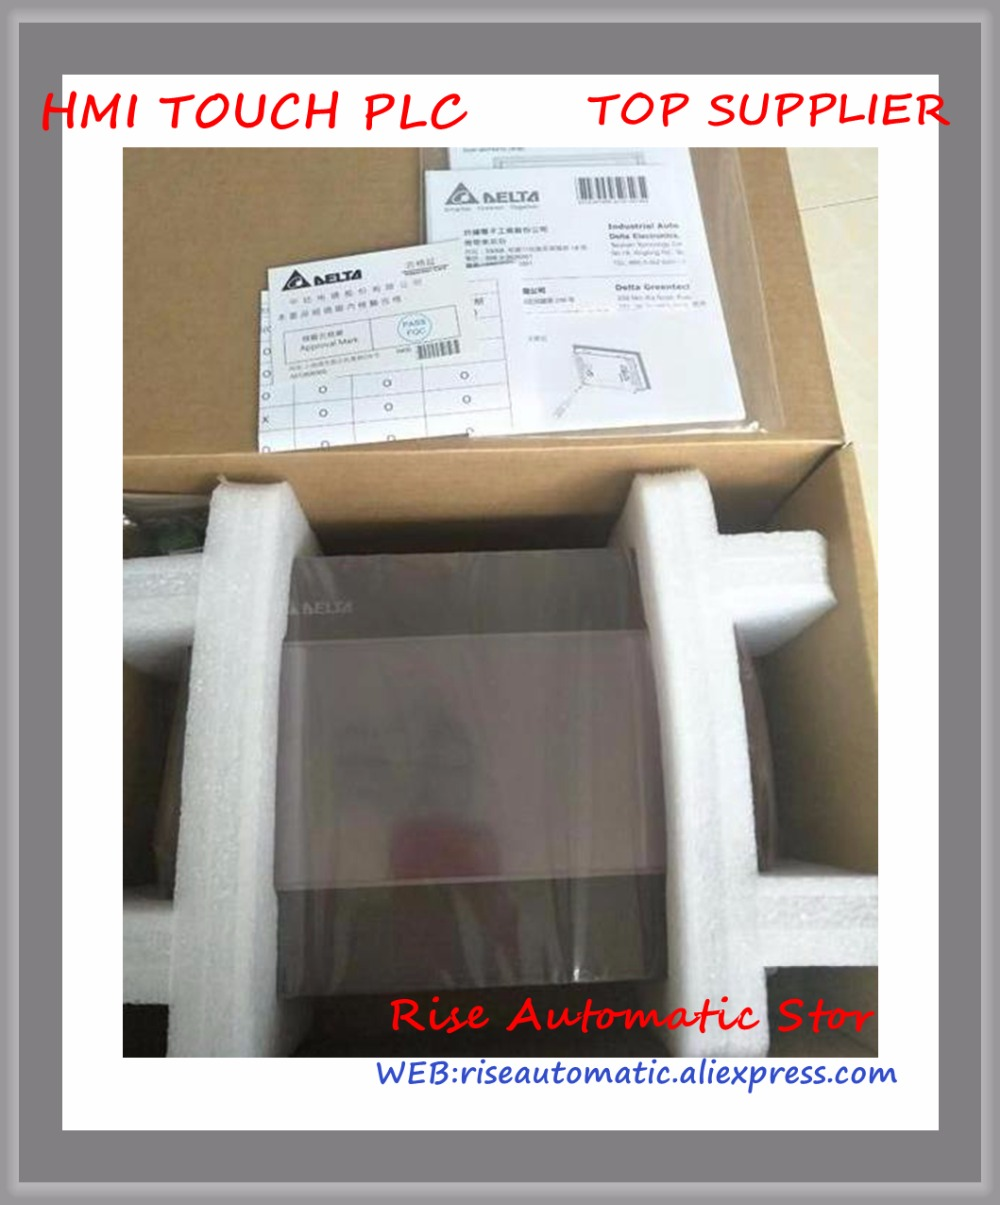 New Original HMI DOP B07S410 DOP B07S411 upgrade to DOP B07SS411 Touch Screen 1 year warranty